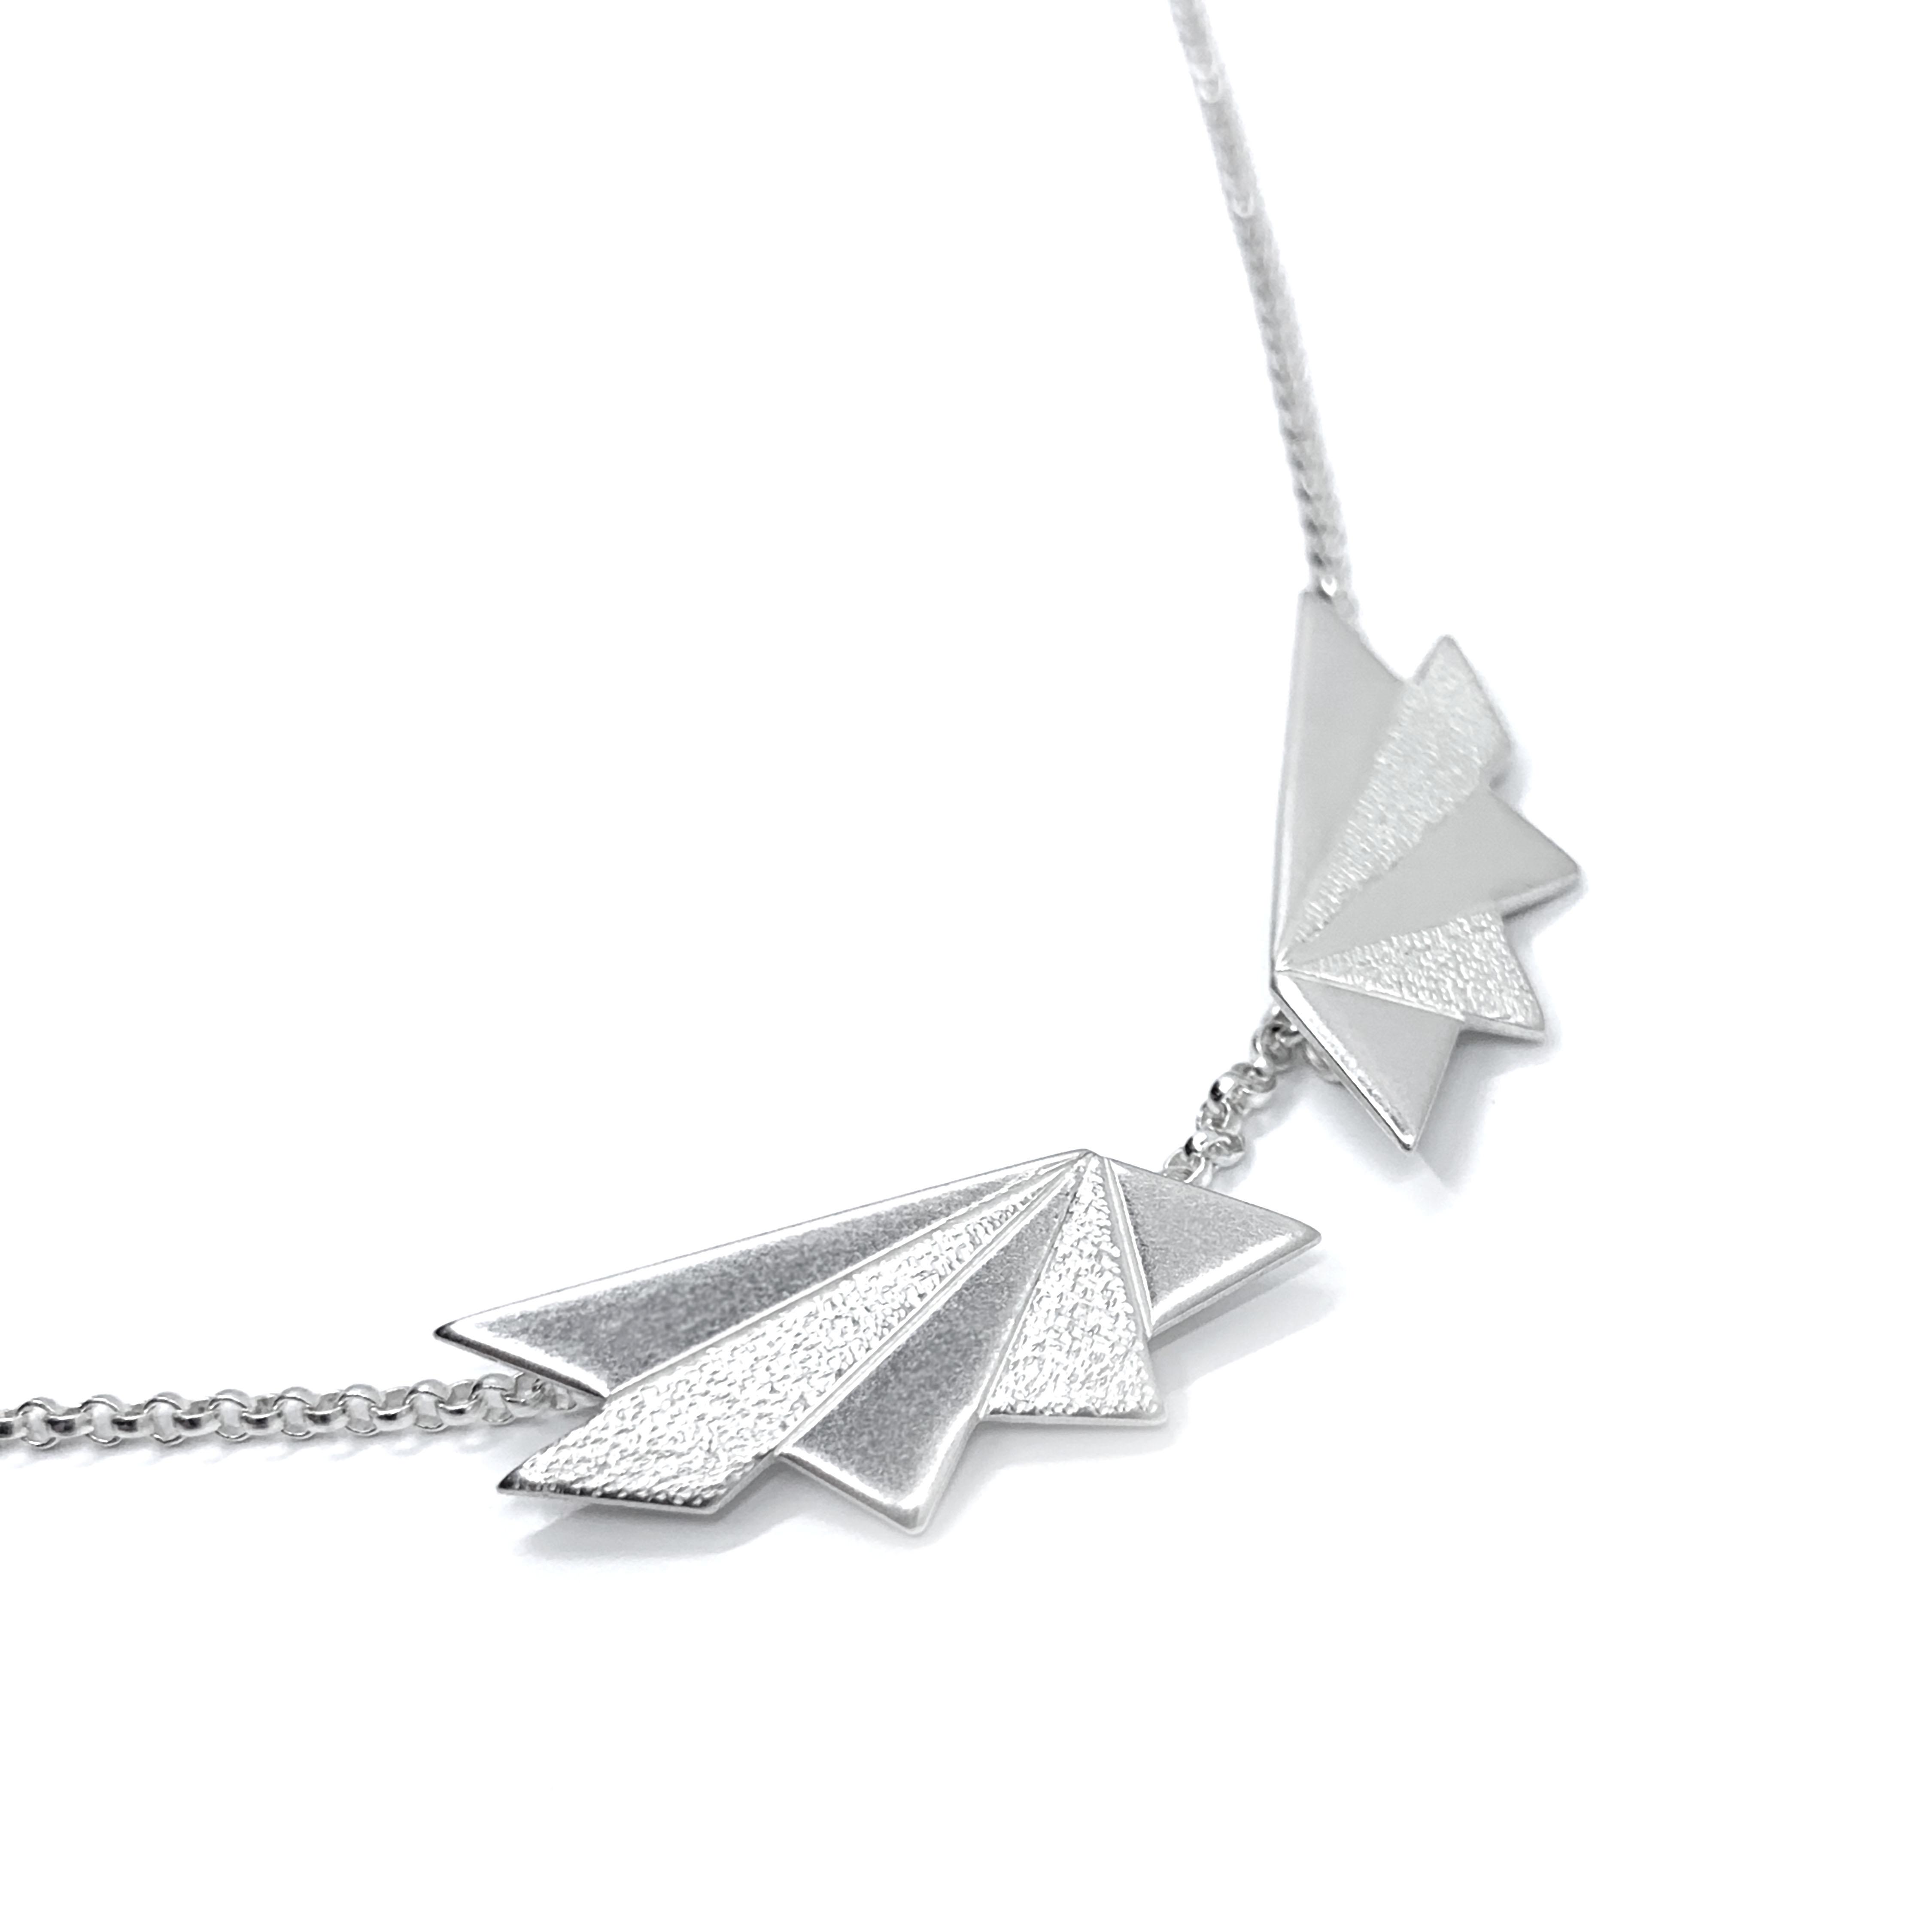 Contrasts 2 silver collar necklace